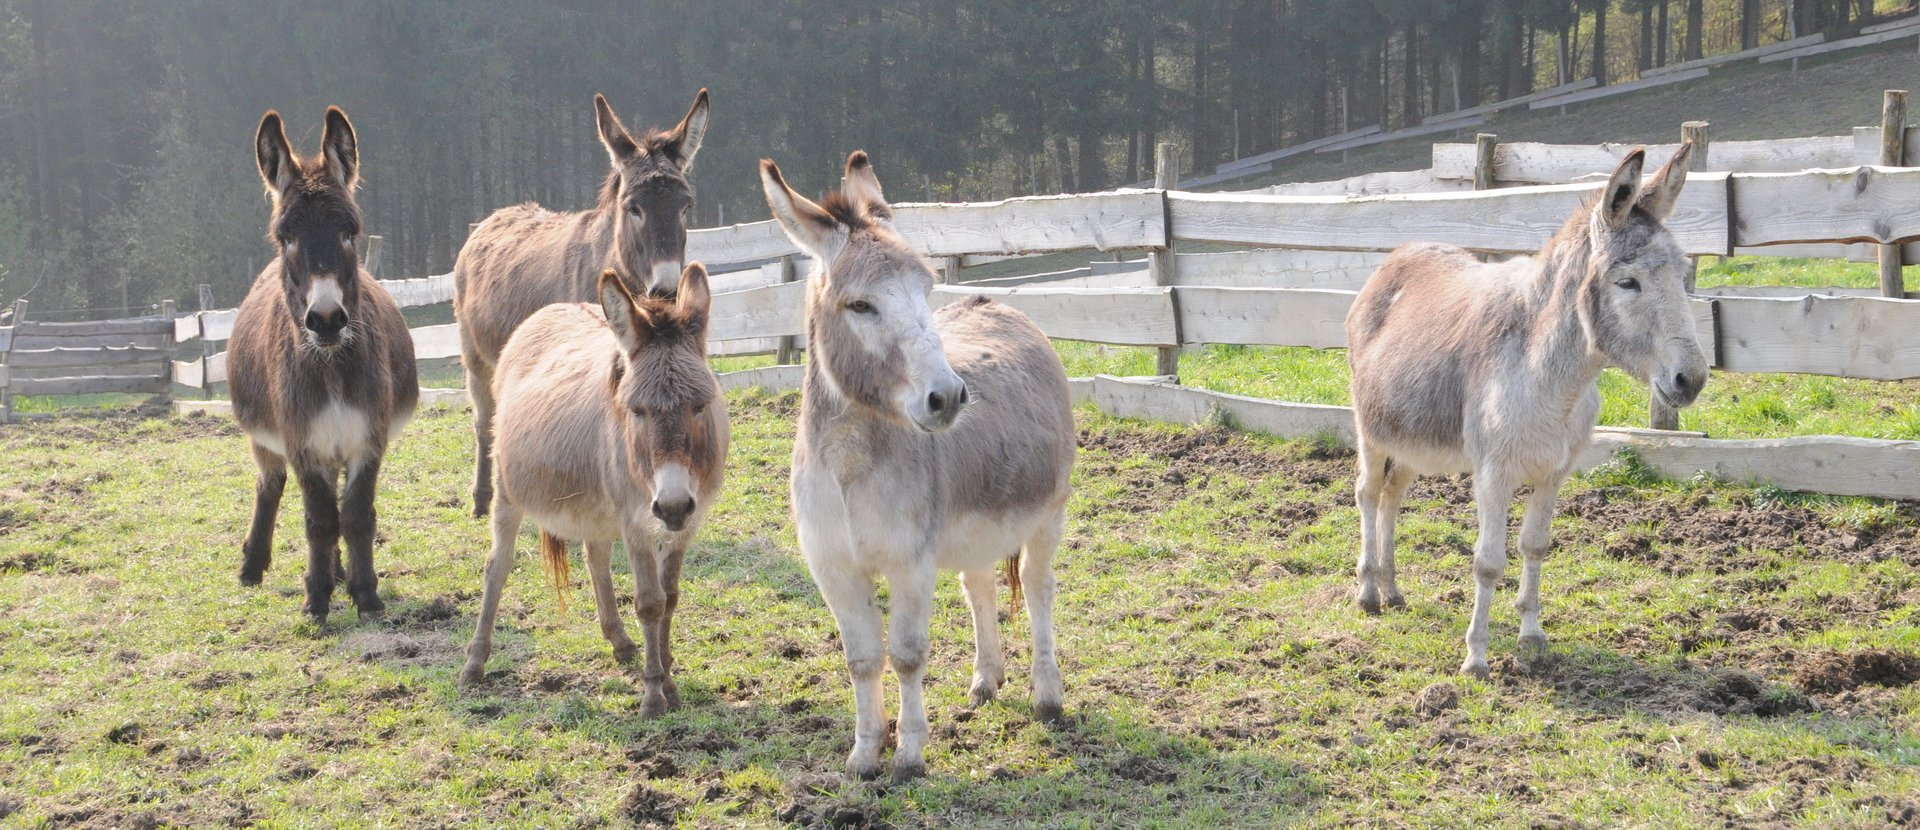 Esel in Esternberg